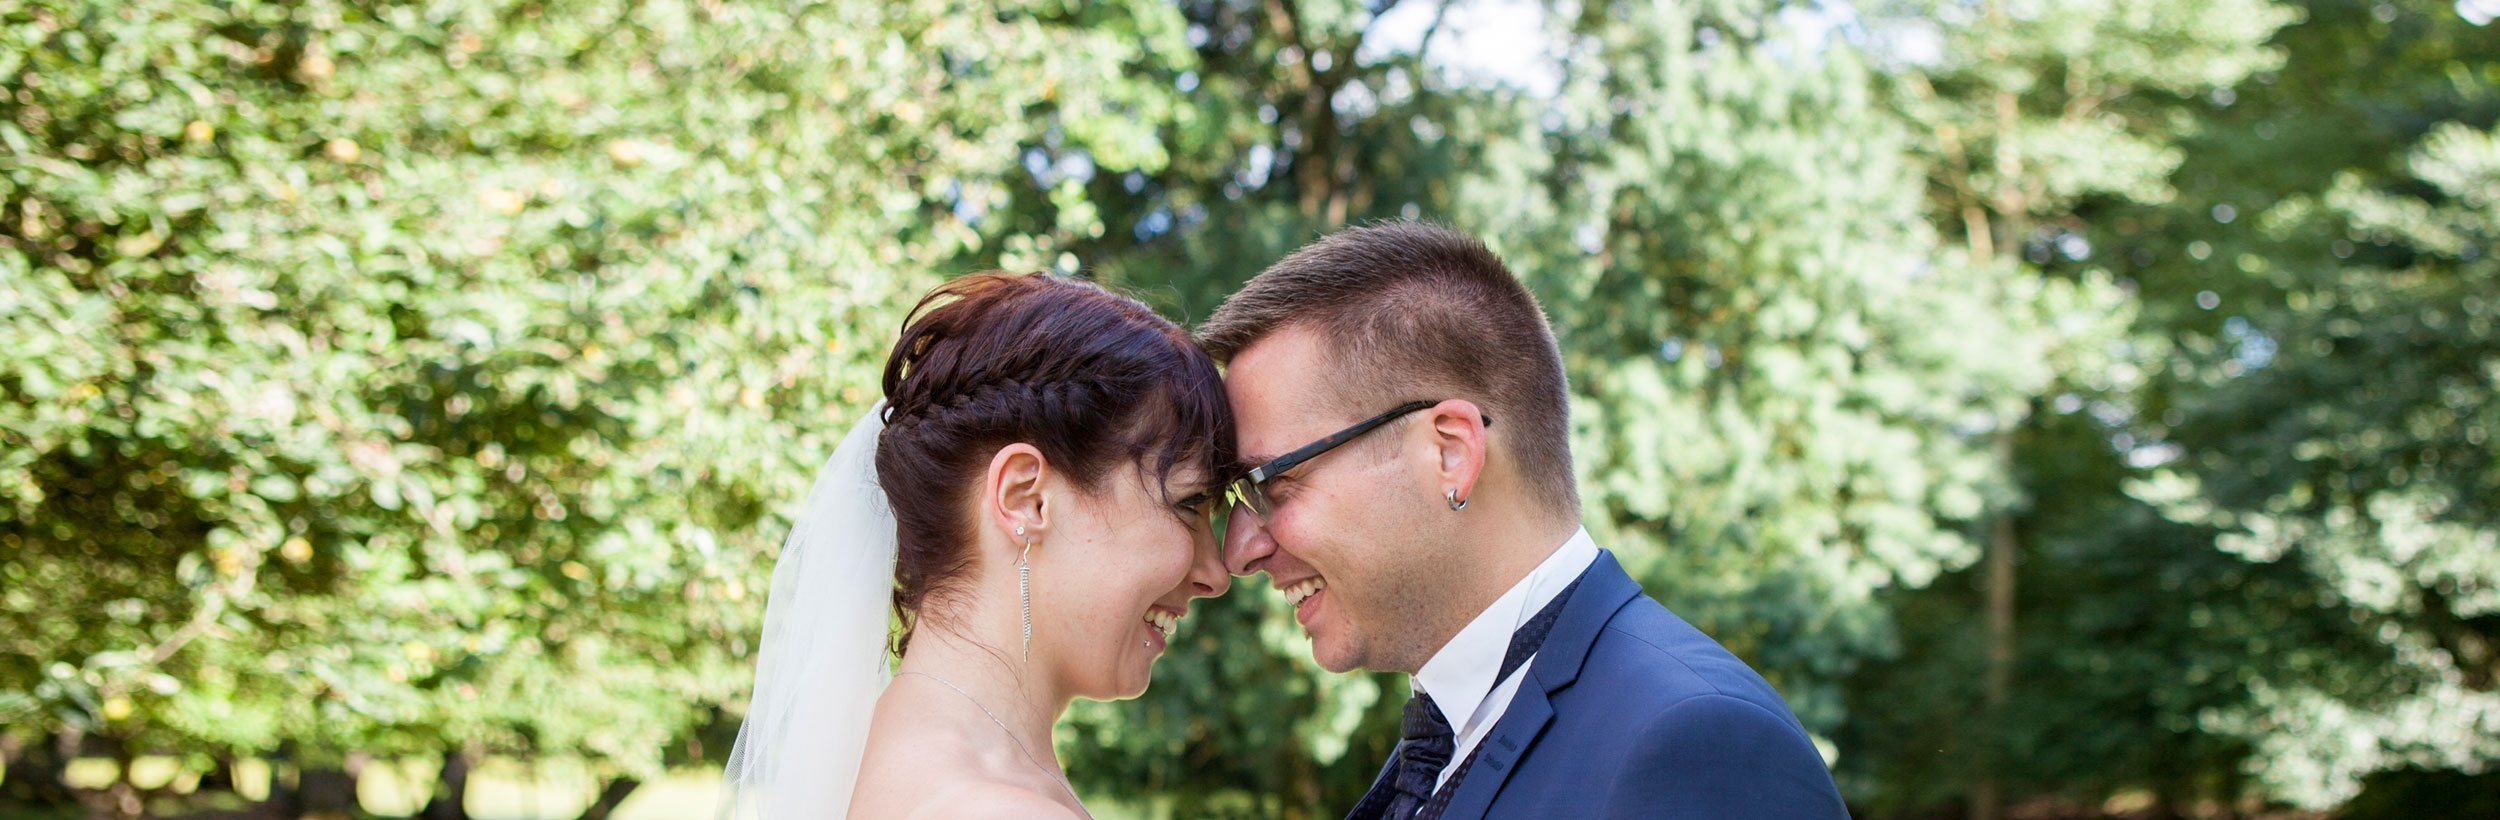 particuliers-evenements-mariage-oui-aurelie&geoffrey-pagetop